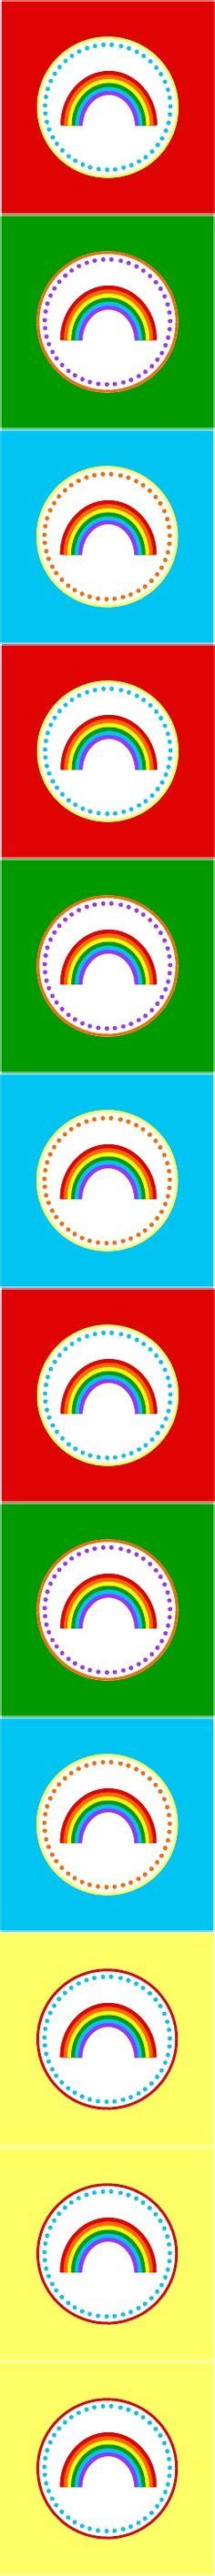 Raindrop Party Circles and Invitation Front - Tomkat Studio Rainbow Unicorn Party, Rainbow Theme, Rainbow Birthday, Fiesta Little Pony, My Little Pony Party, Abc Party, Craft Party, Teddy Bear Party, Party Printables